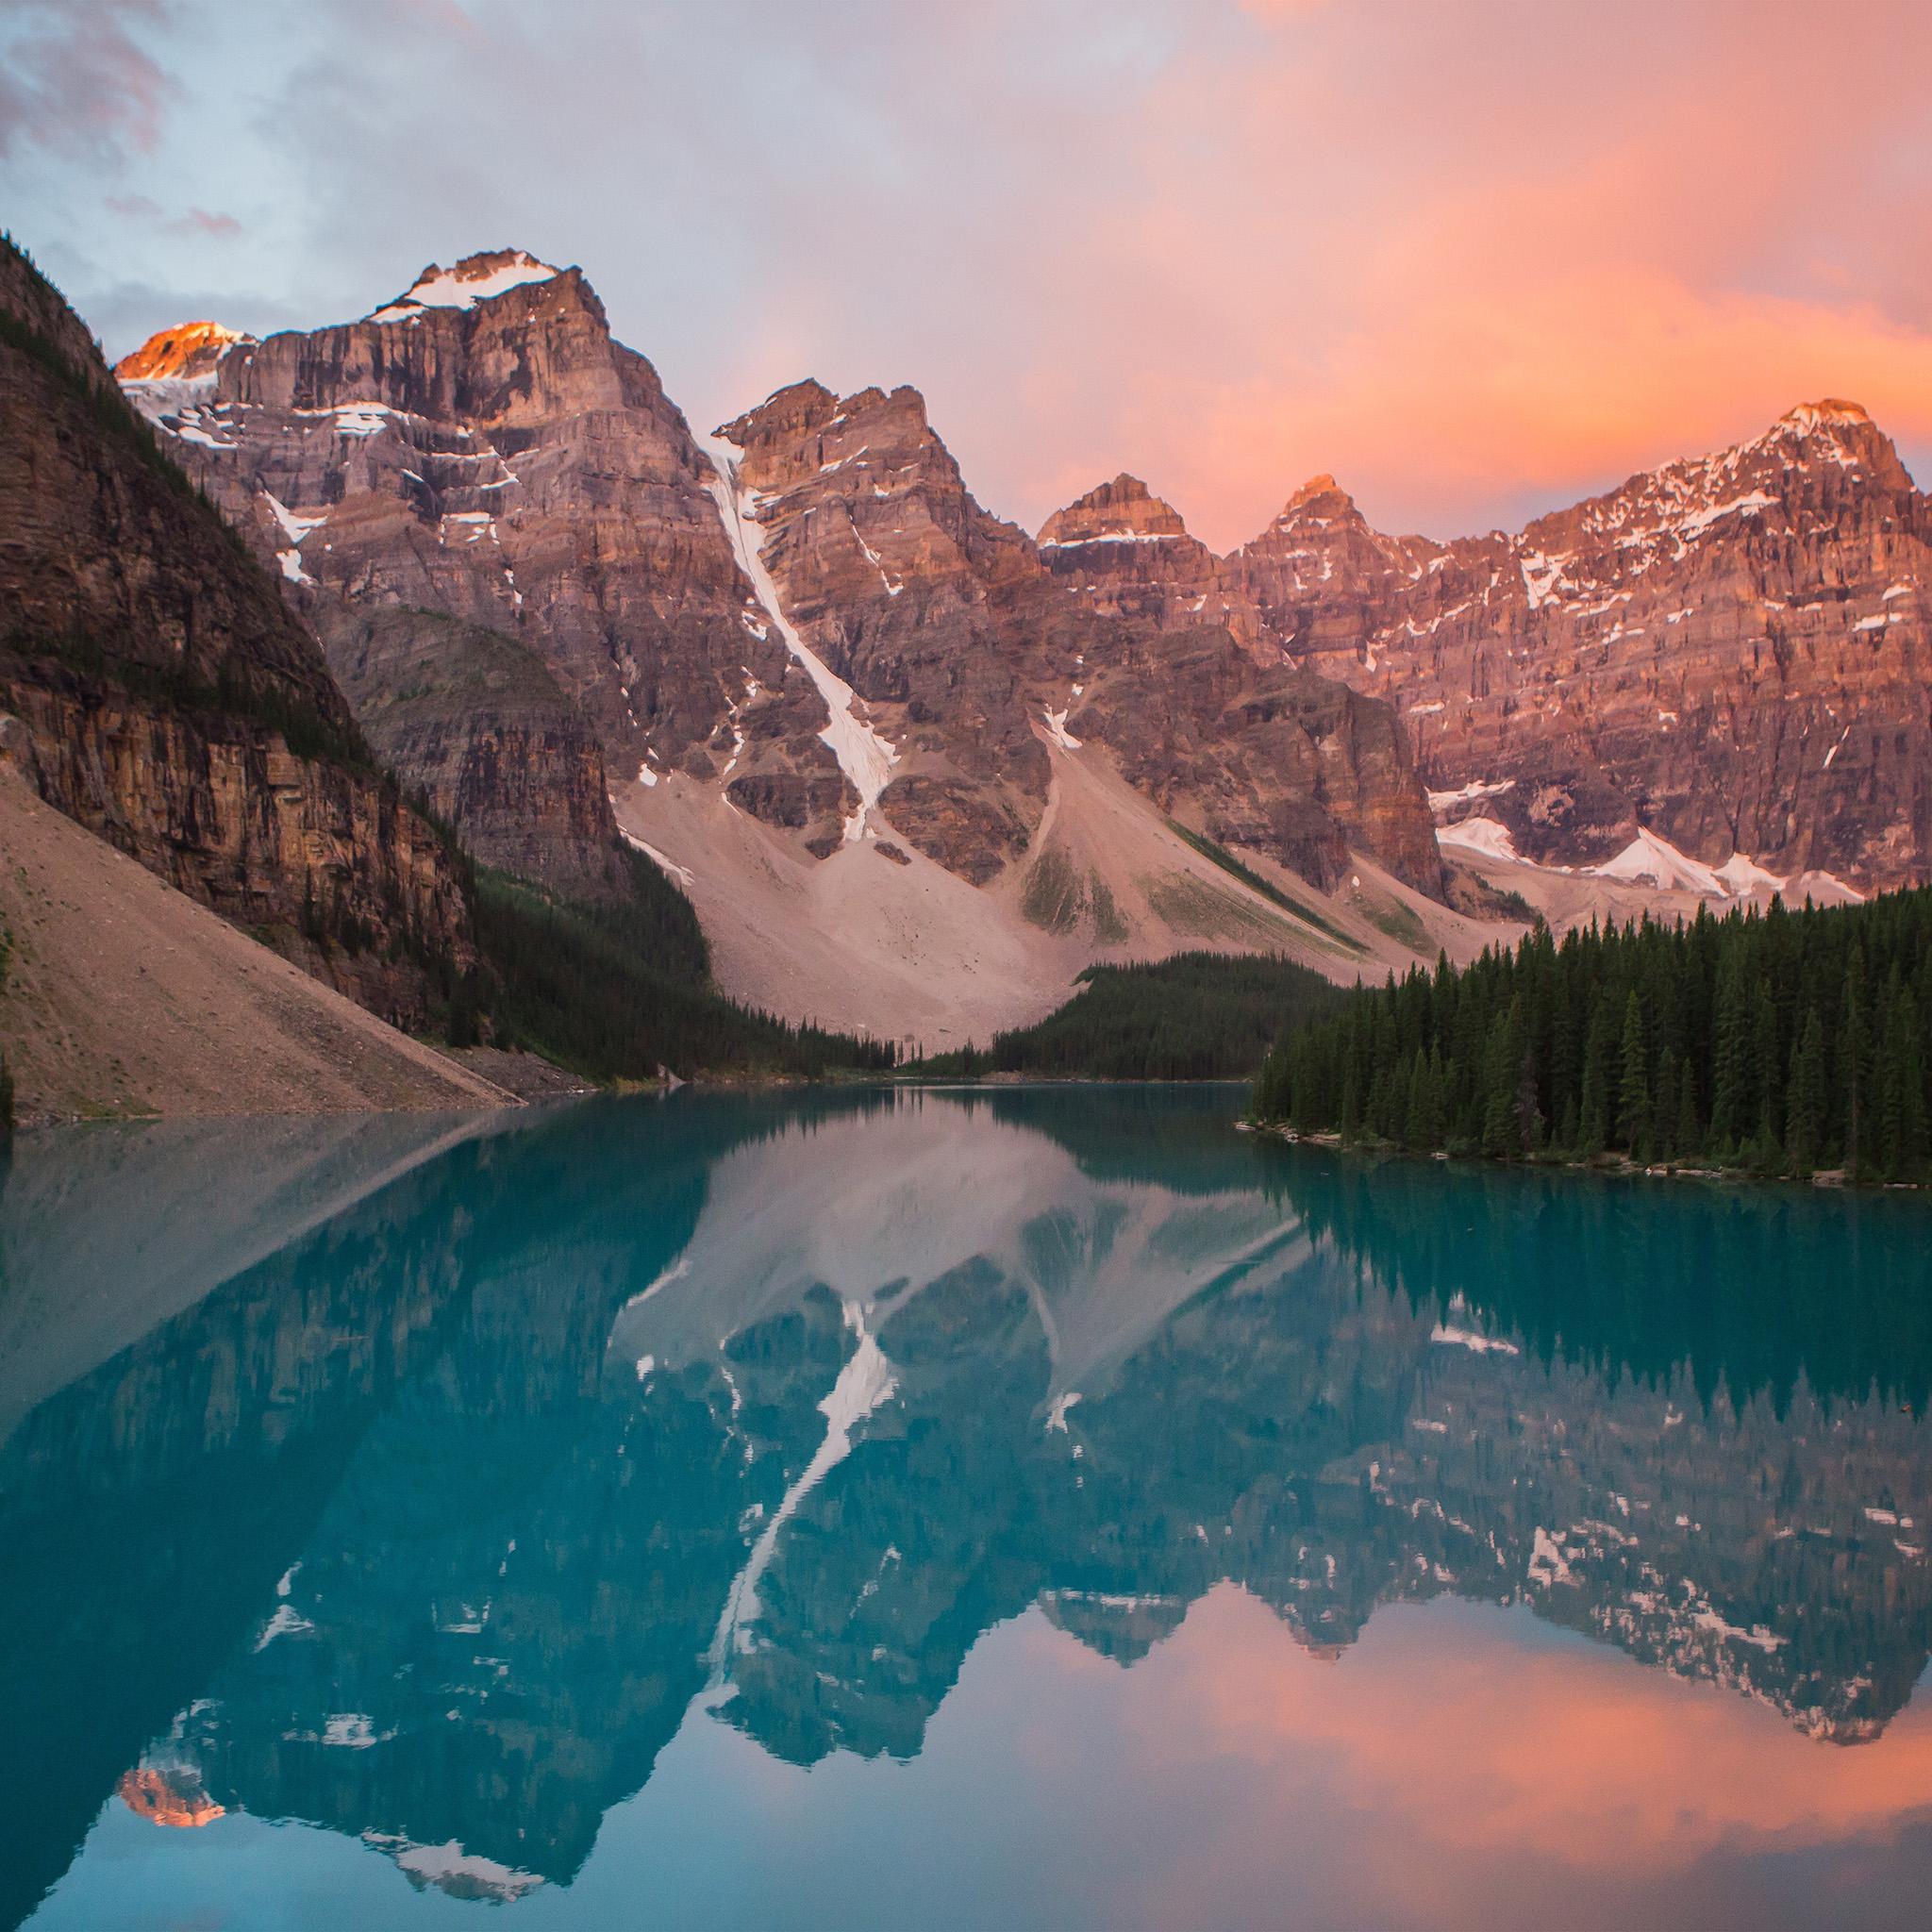 Samsung Galaxy Wallpaper Hd Ns24 Lake Mountain Pink Sunset Nature Wallpaper